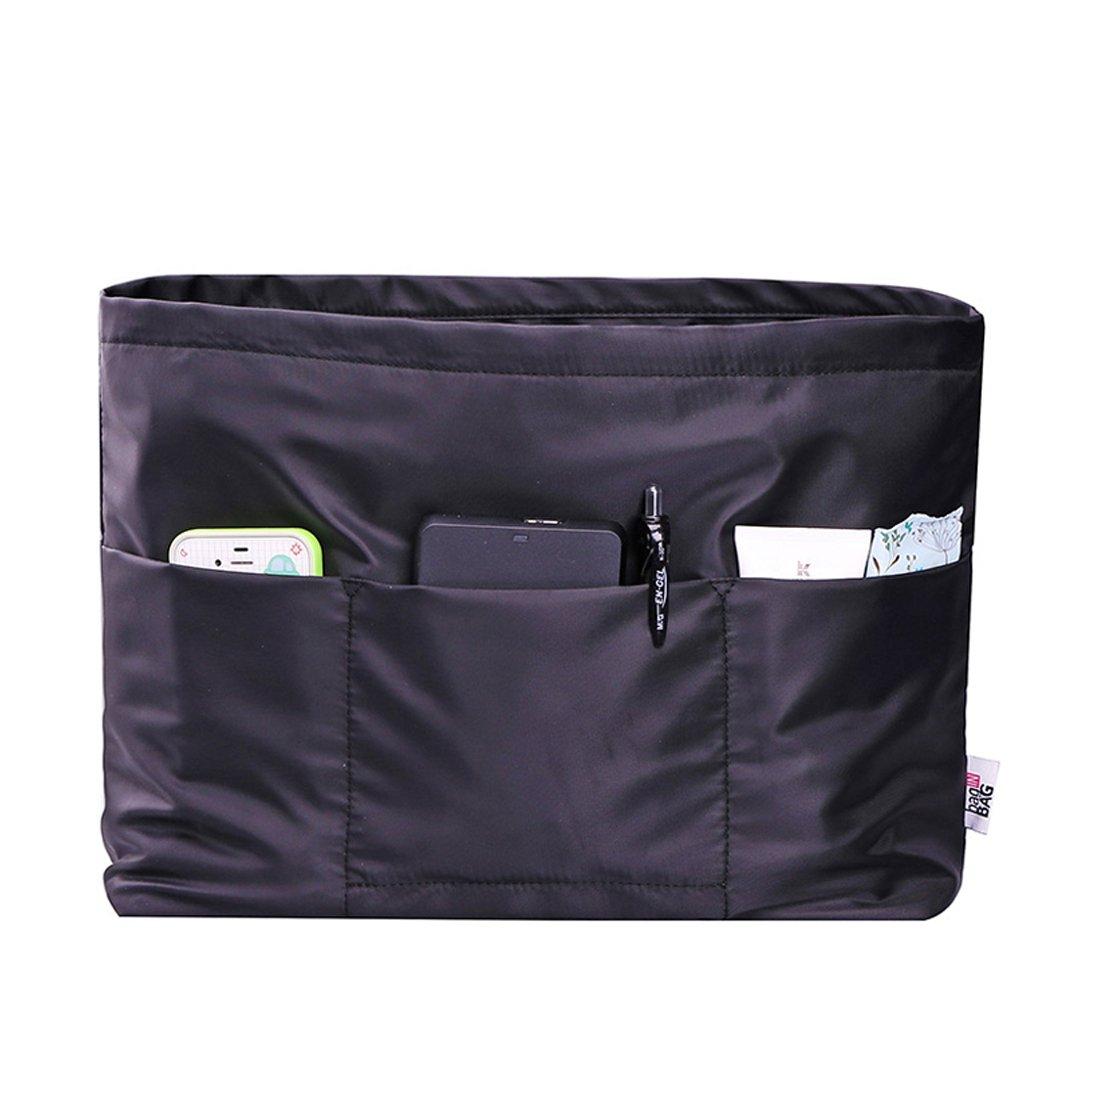 IN Purse Organizer Handbag Organizer Insert for Tote Bag Shaper nylon Multi-pocket Travel Purse Liner for Neverfull PM MM GM (Black, Large)